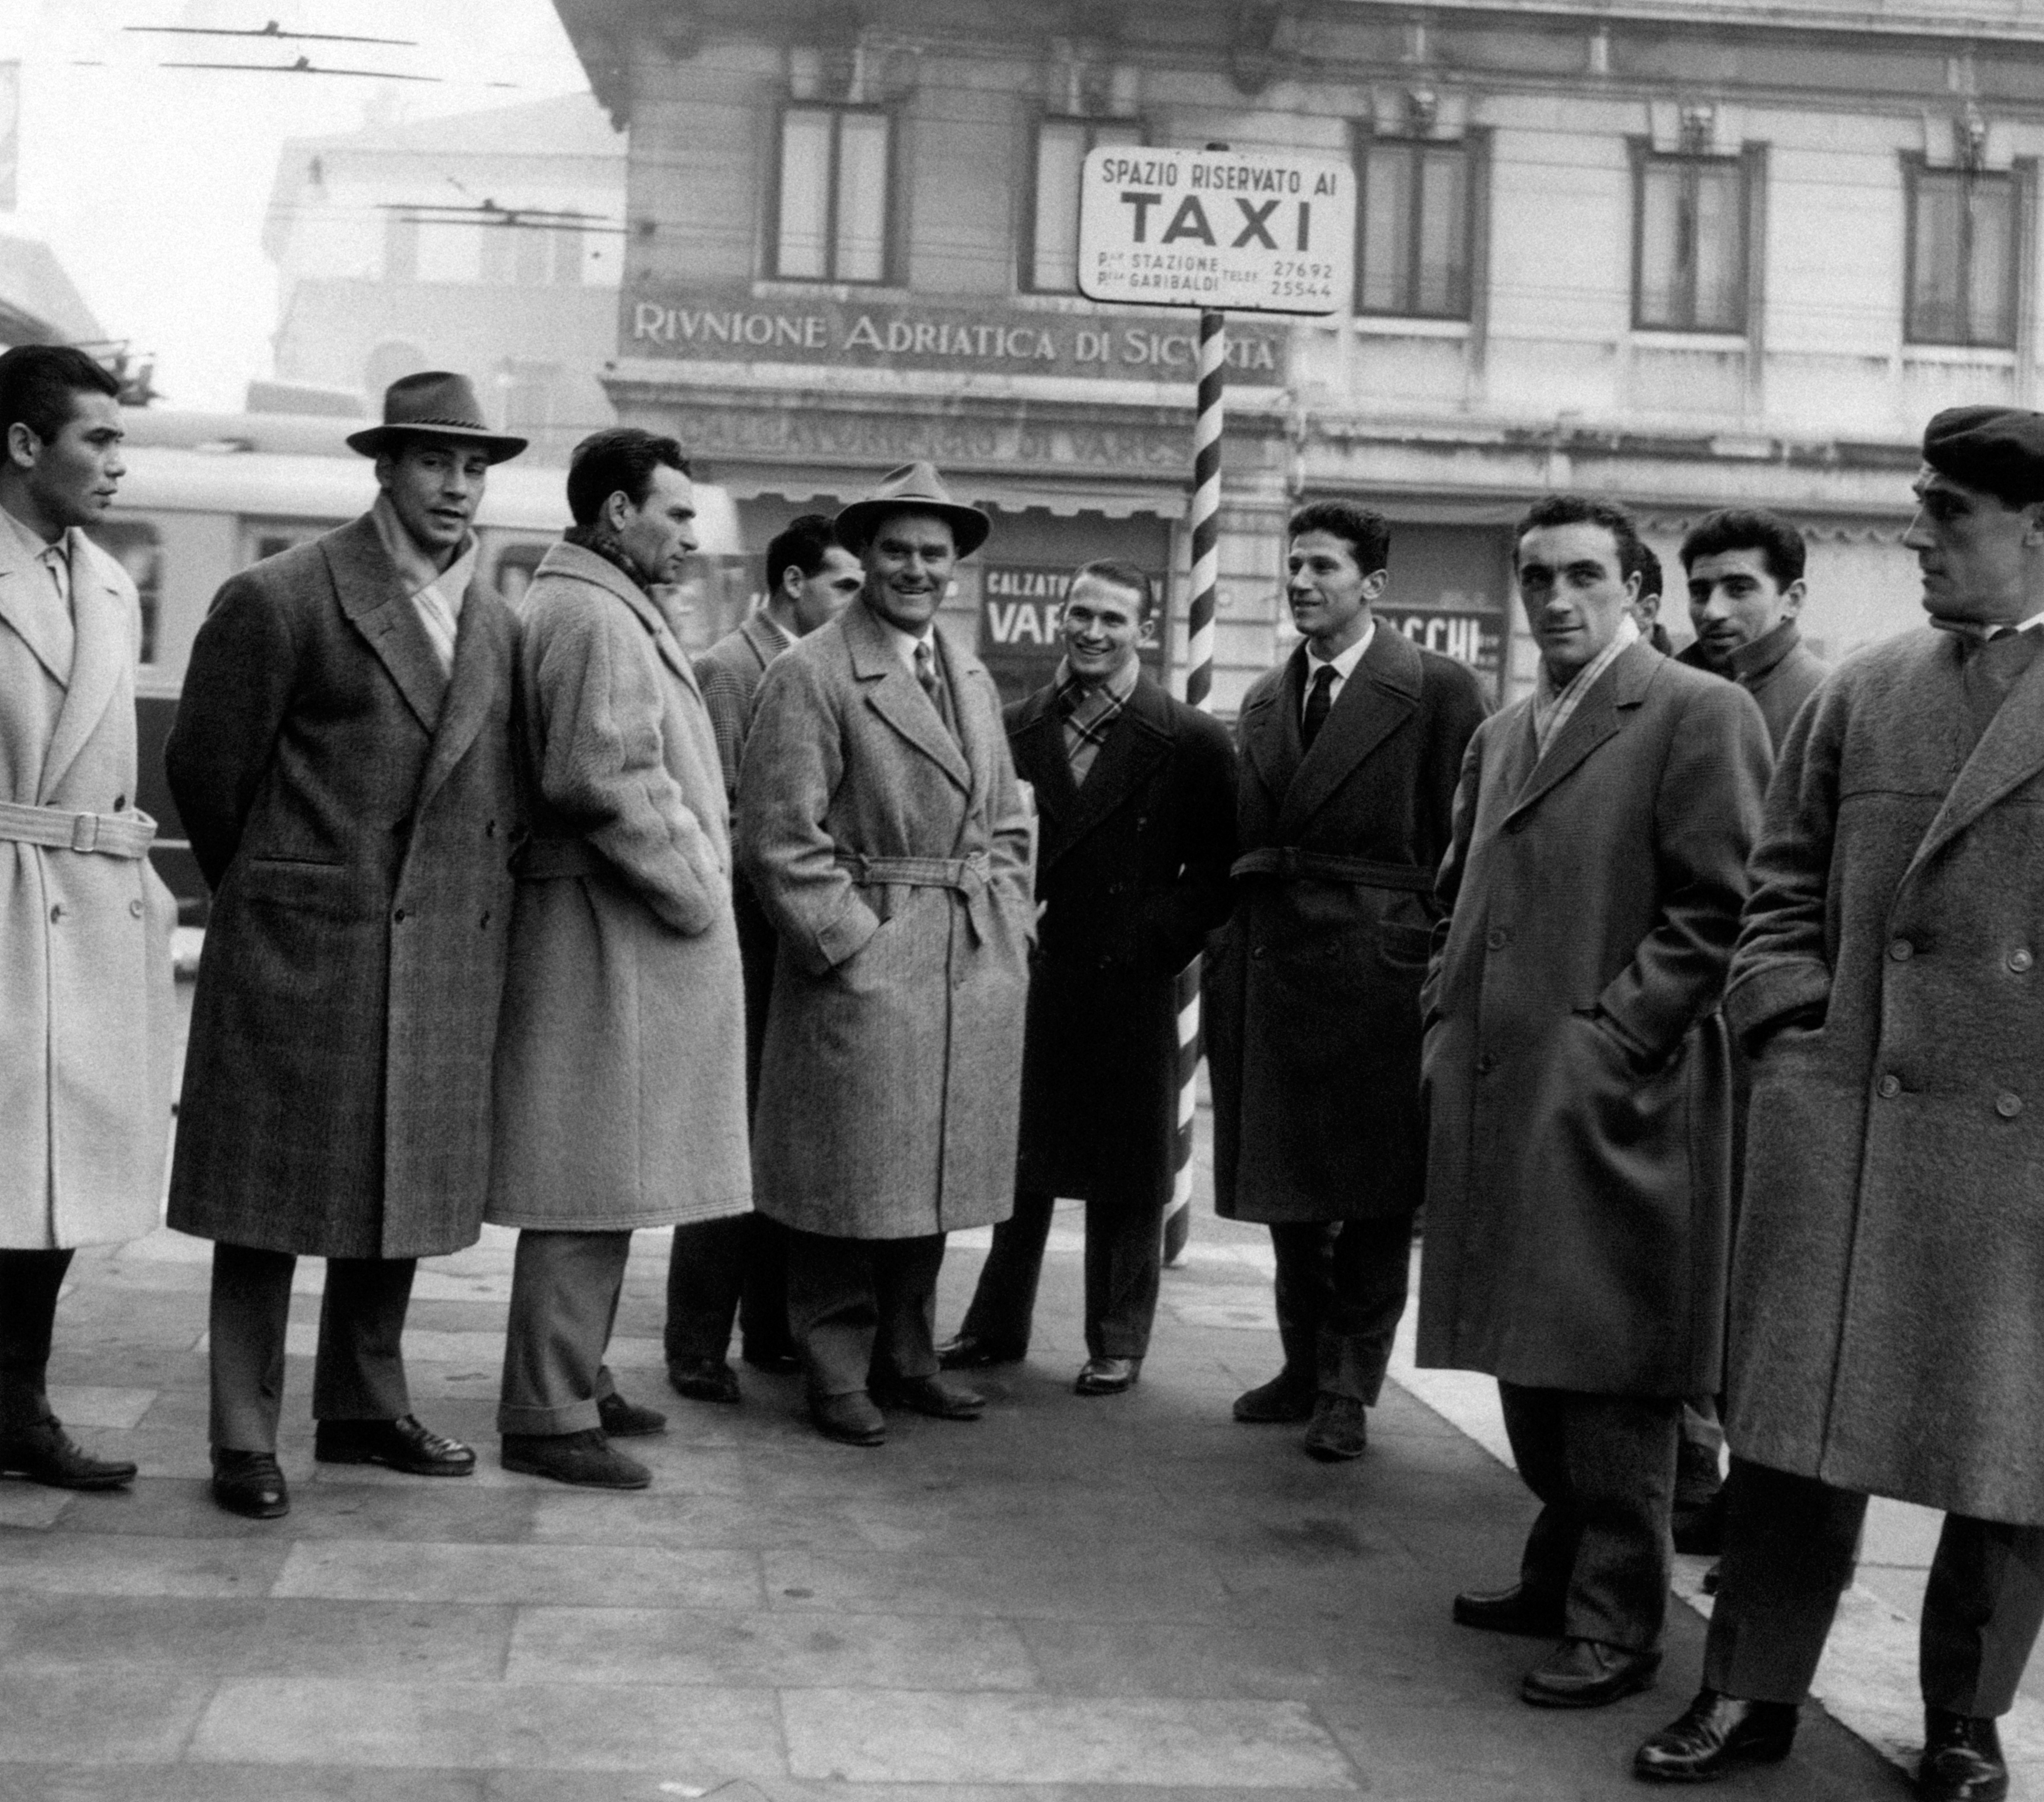 Giacomo Mari, Sergio Brighenti, Kurt Hamrin and Nereo Rocco members of the Associazione Calcio Padova